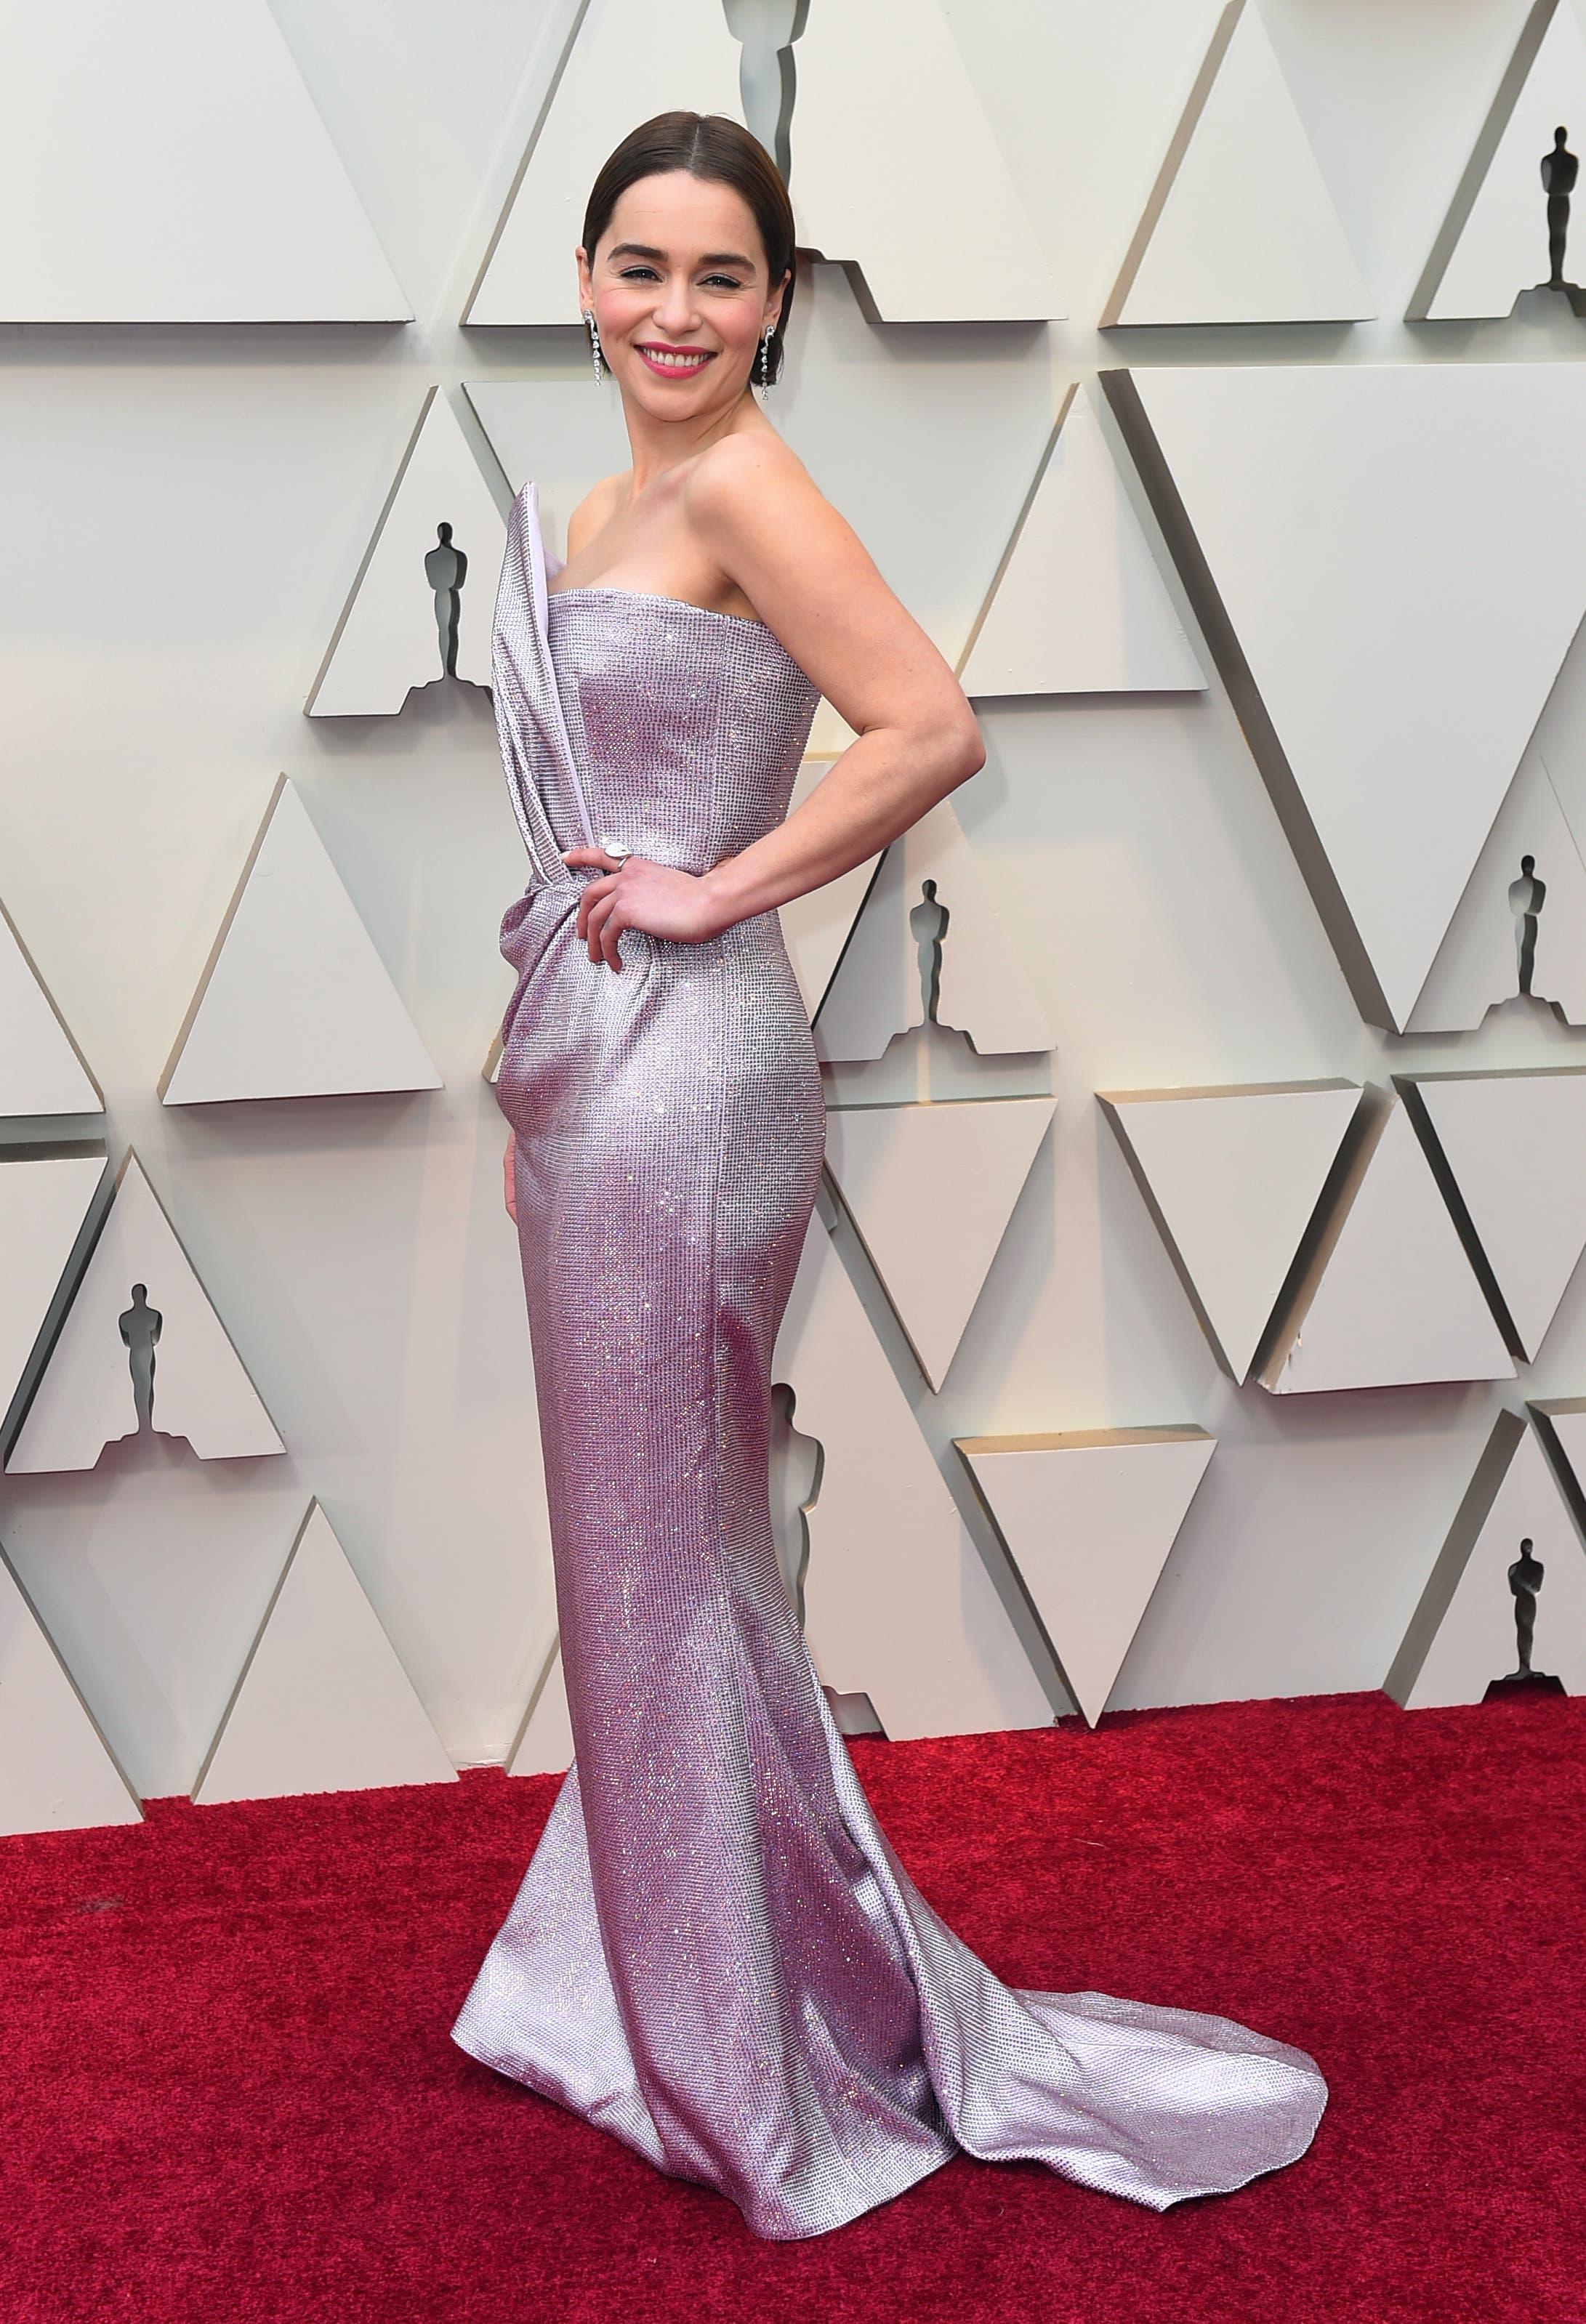 Emilia Clarke. (Bild: Jordan Strauss/Invision/AP)